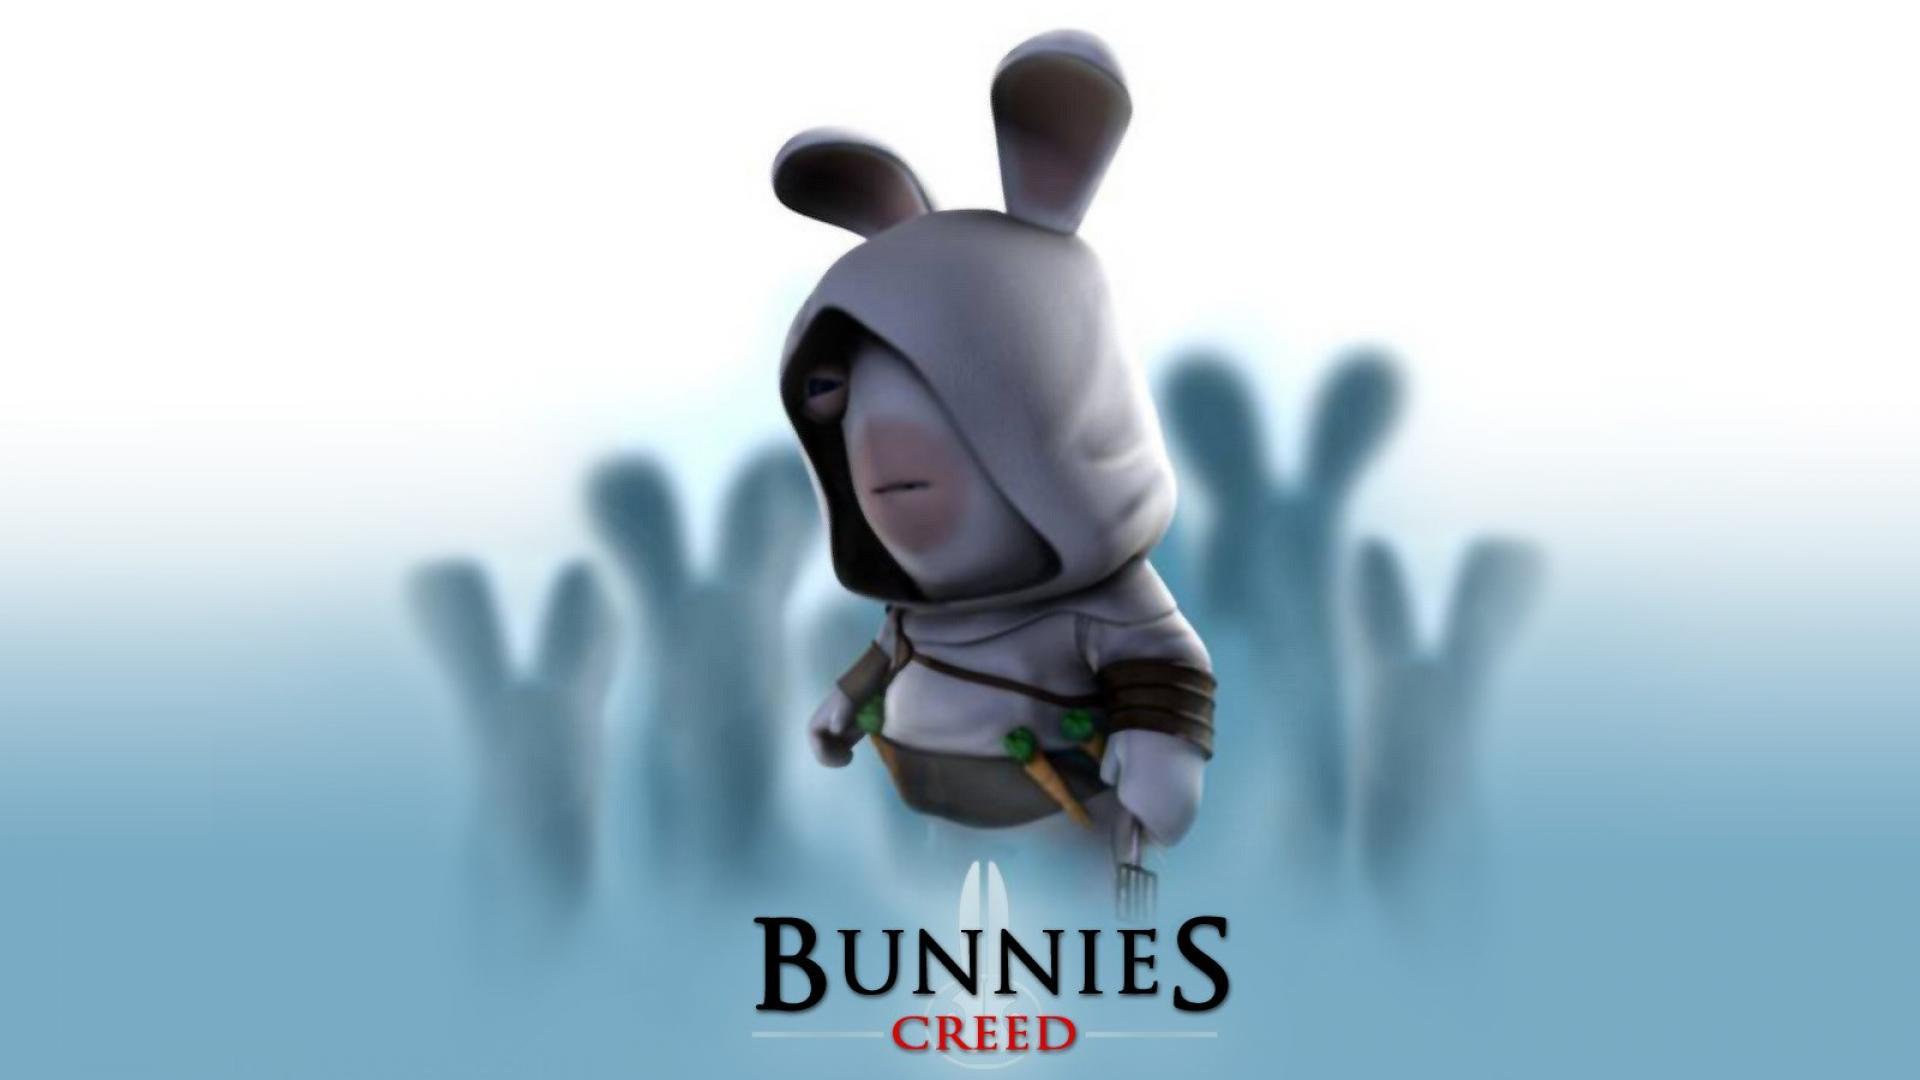 Bunny Bunnies Creed Funny Humor Wallpaper